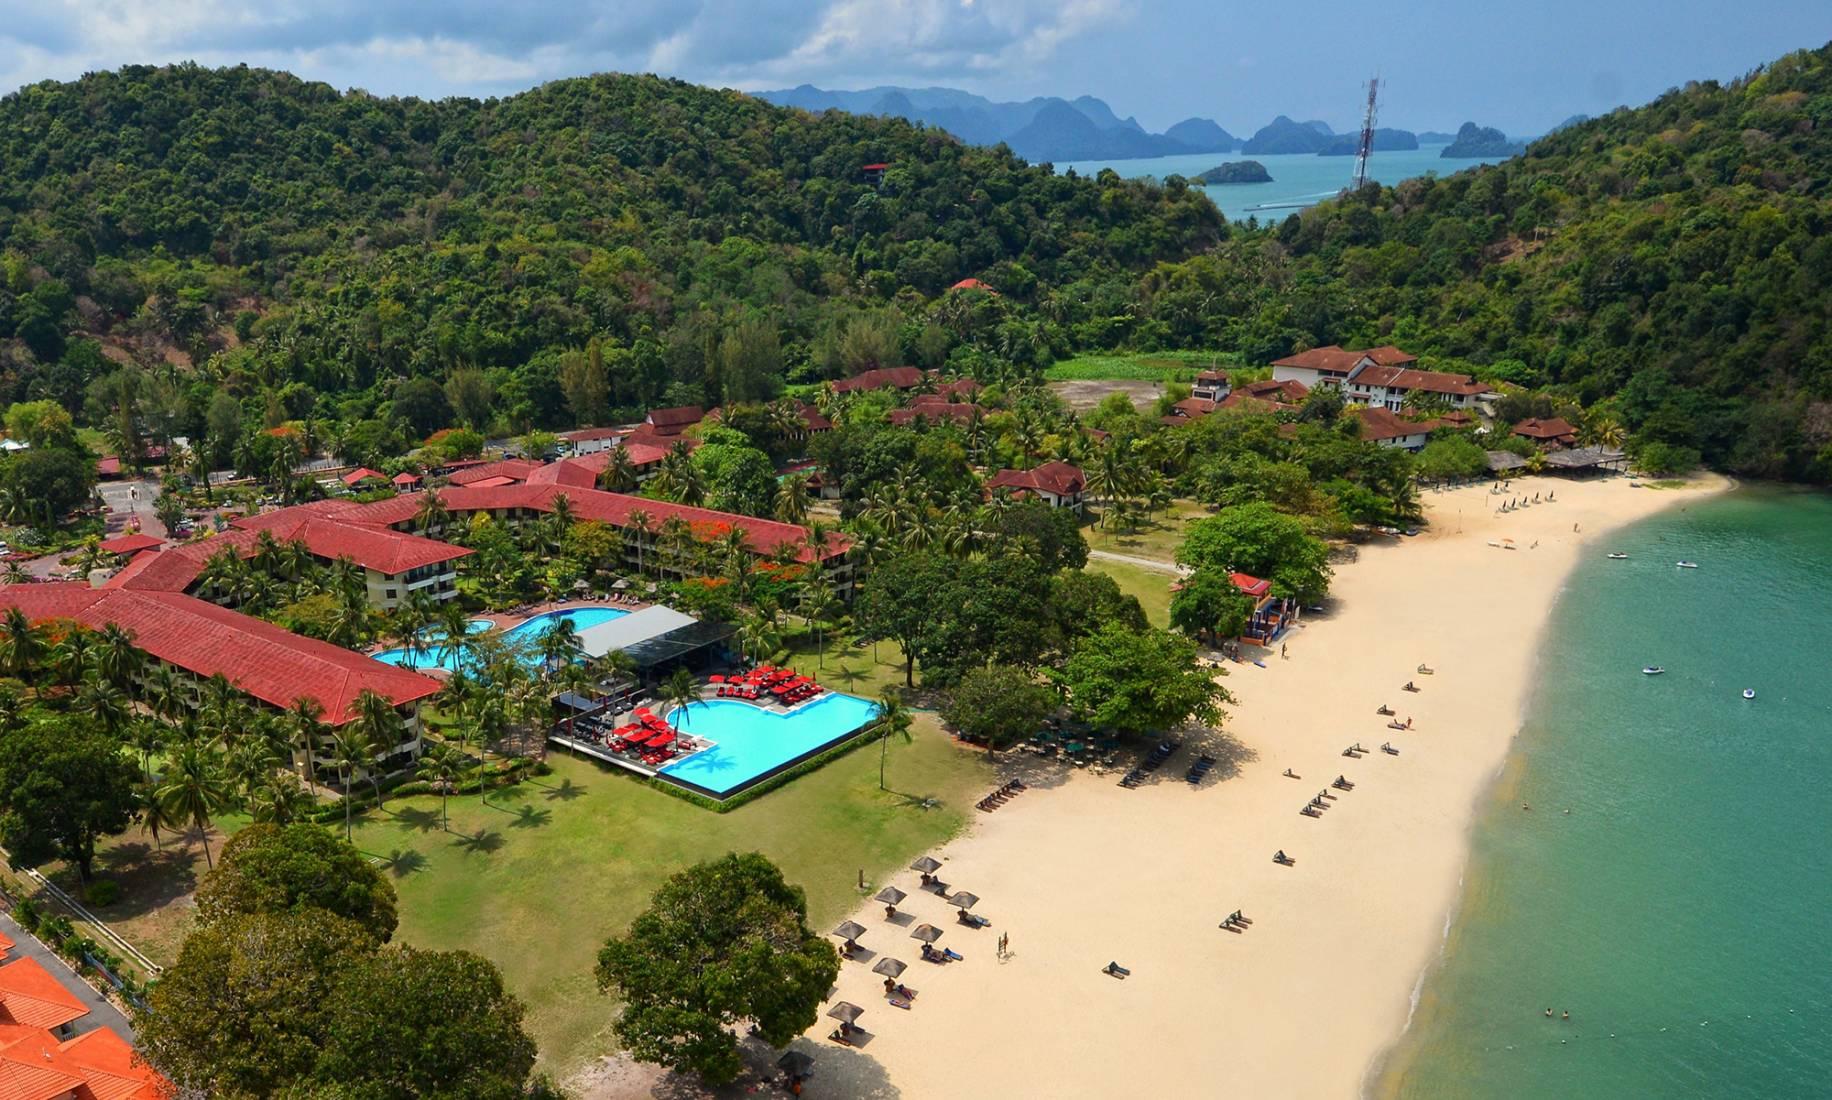 Holiday Villa Beach Resort Spa Langkawi Kedah Langkawi Hotel Holiday Villa Hotels Resorts